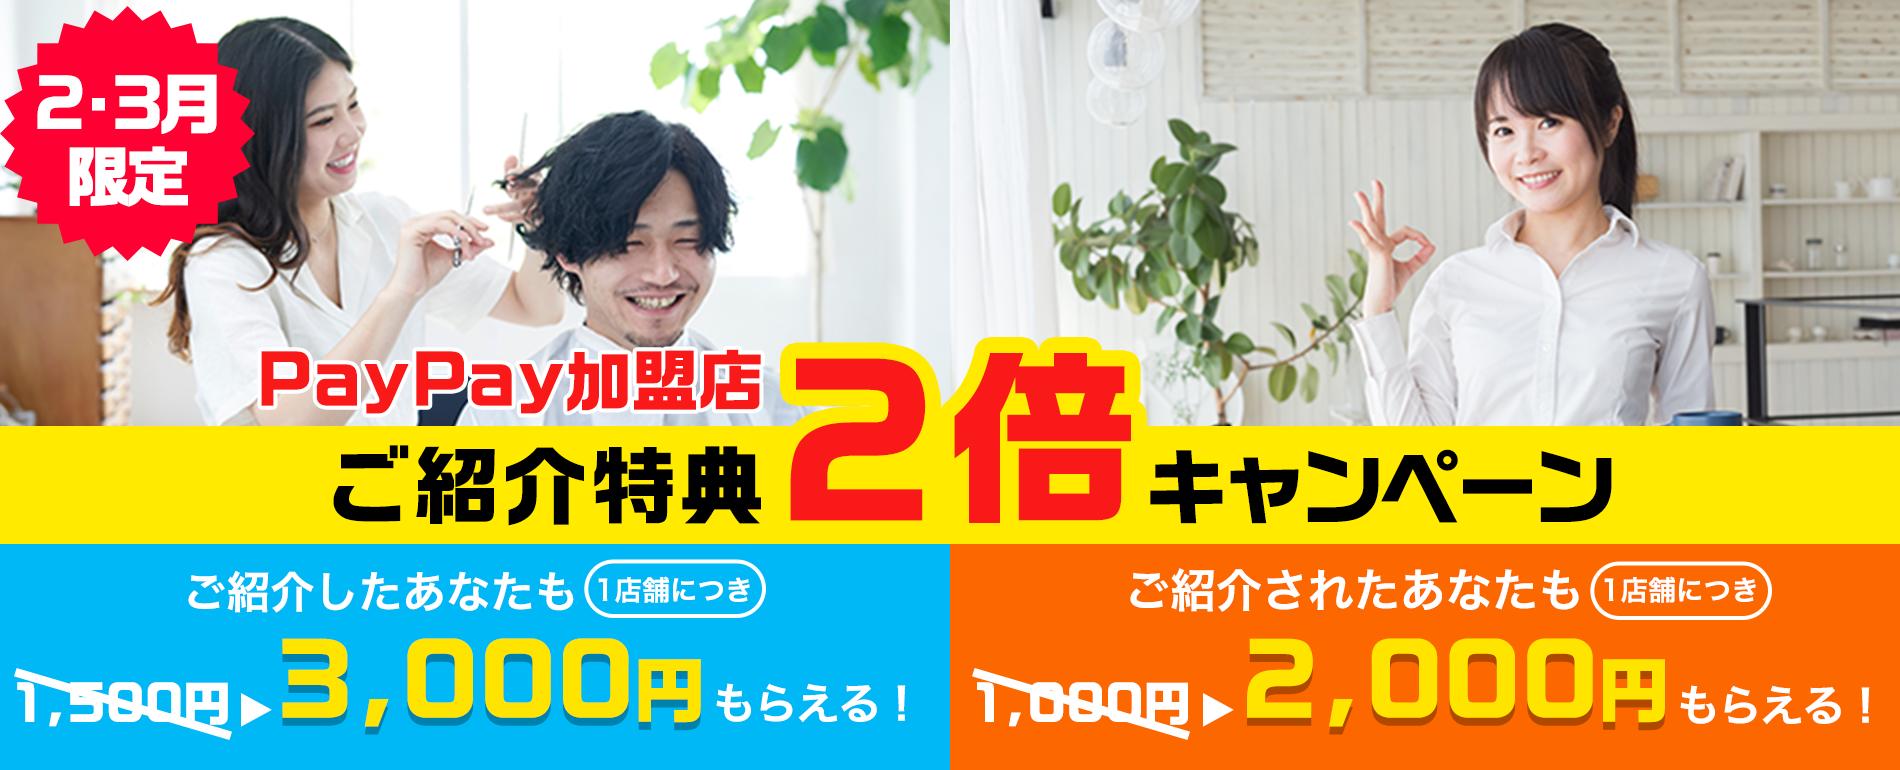 PayPay新規加盟店ご紹介特典2倍キャンペーン!